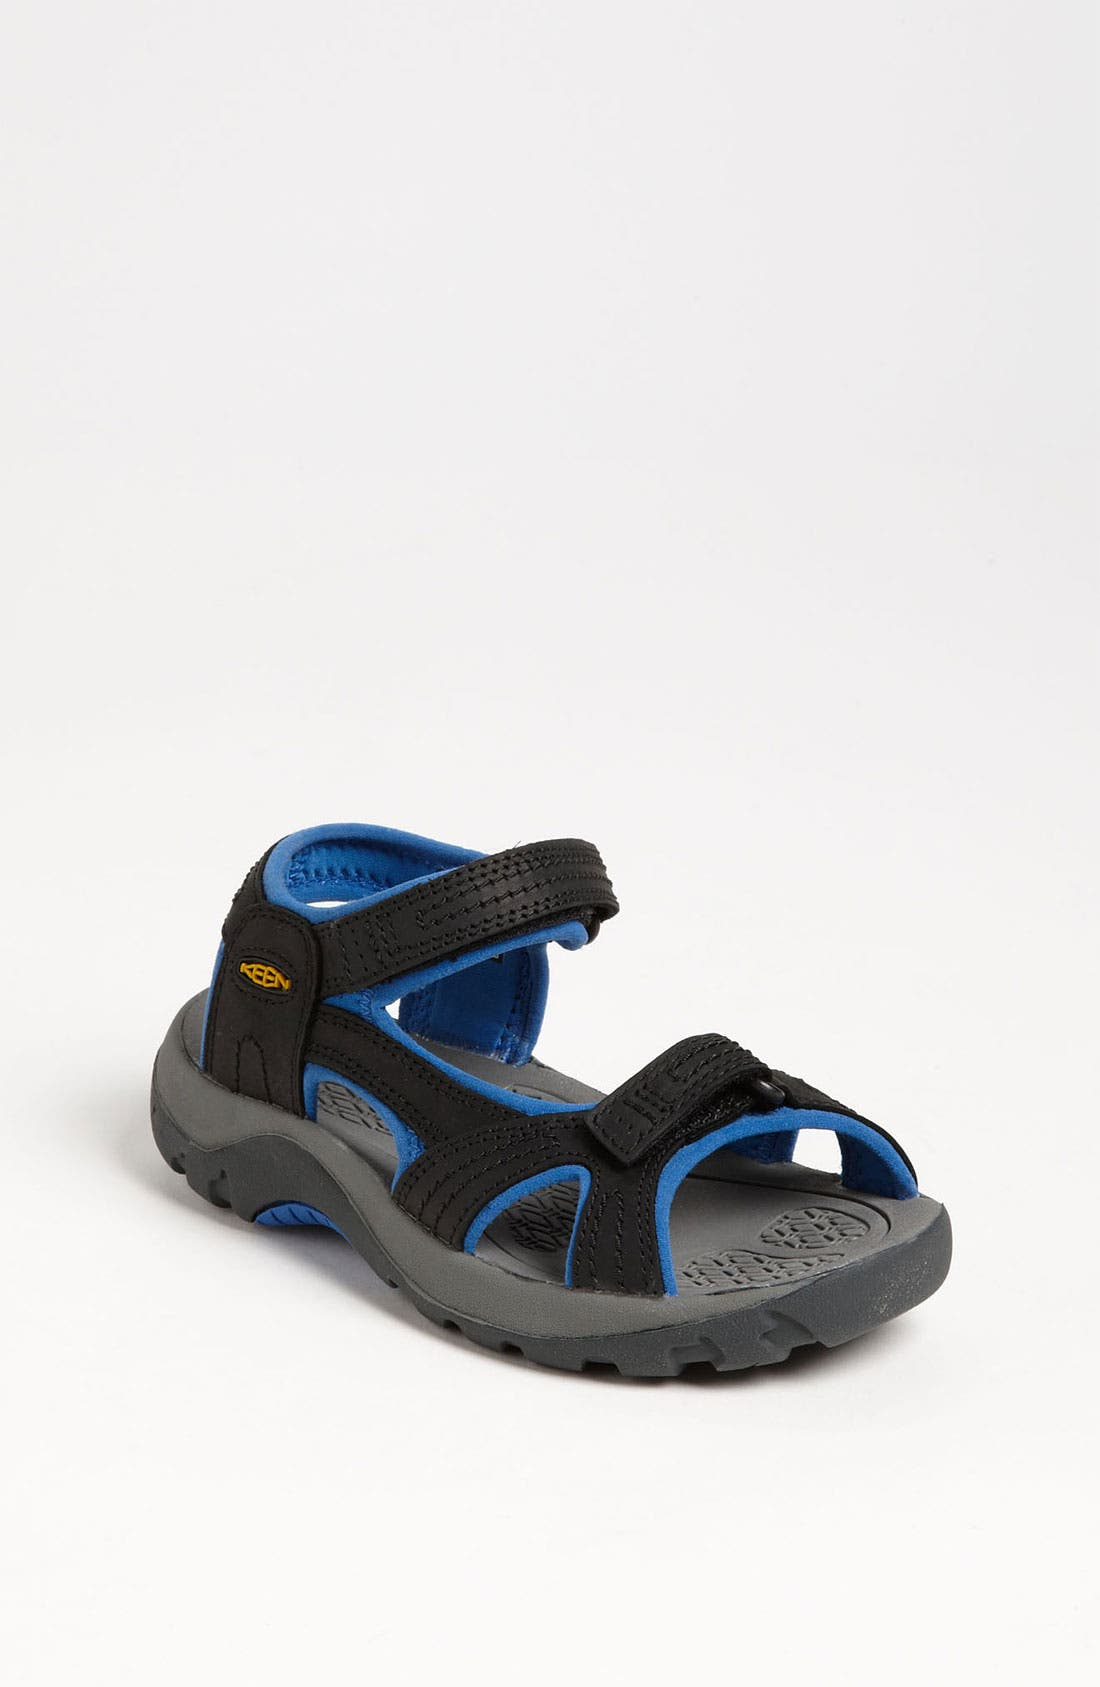 Alternate Image 1 Selected - Keen 'Jura' Leather Sandal (Toddler, Little Kid & Big Kid)